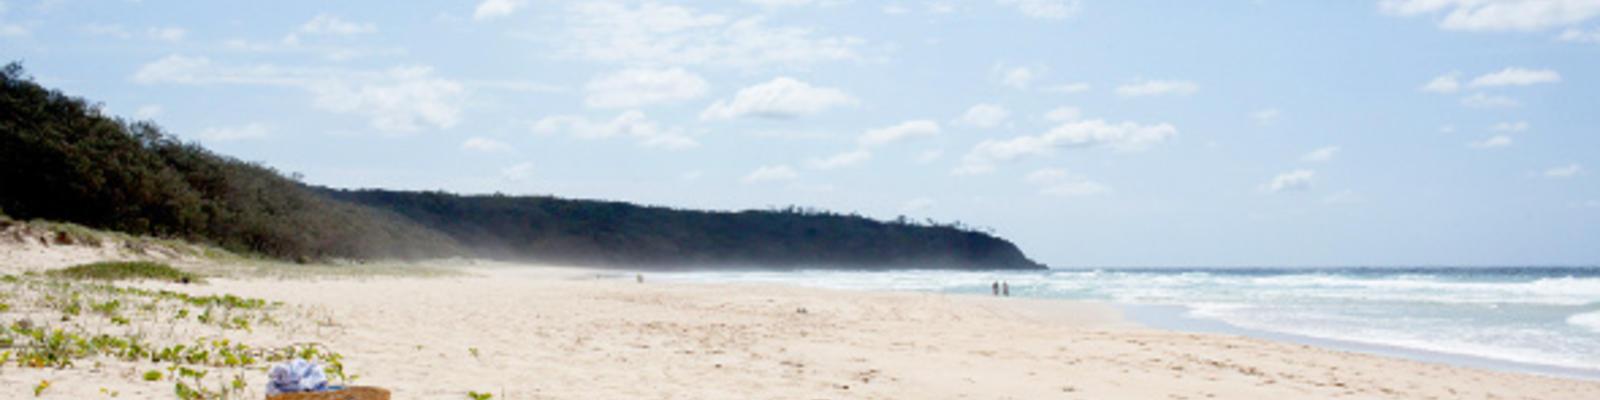 Brisbane day trip | Sunshine Coast